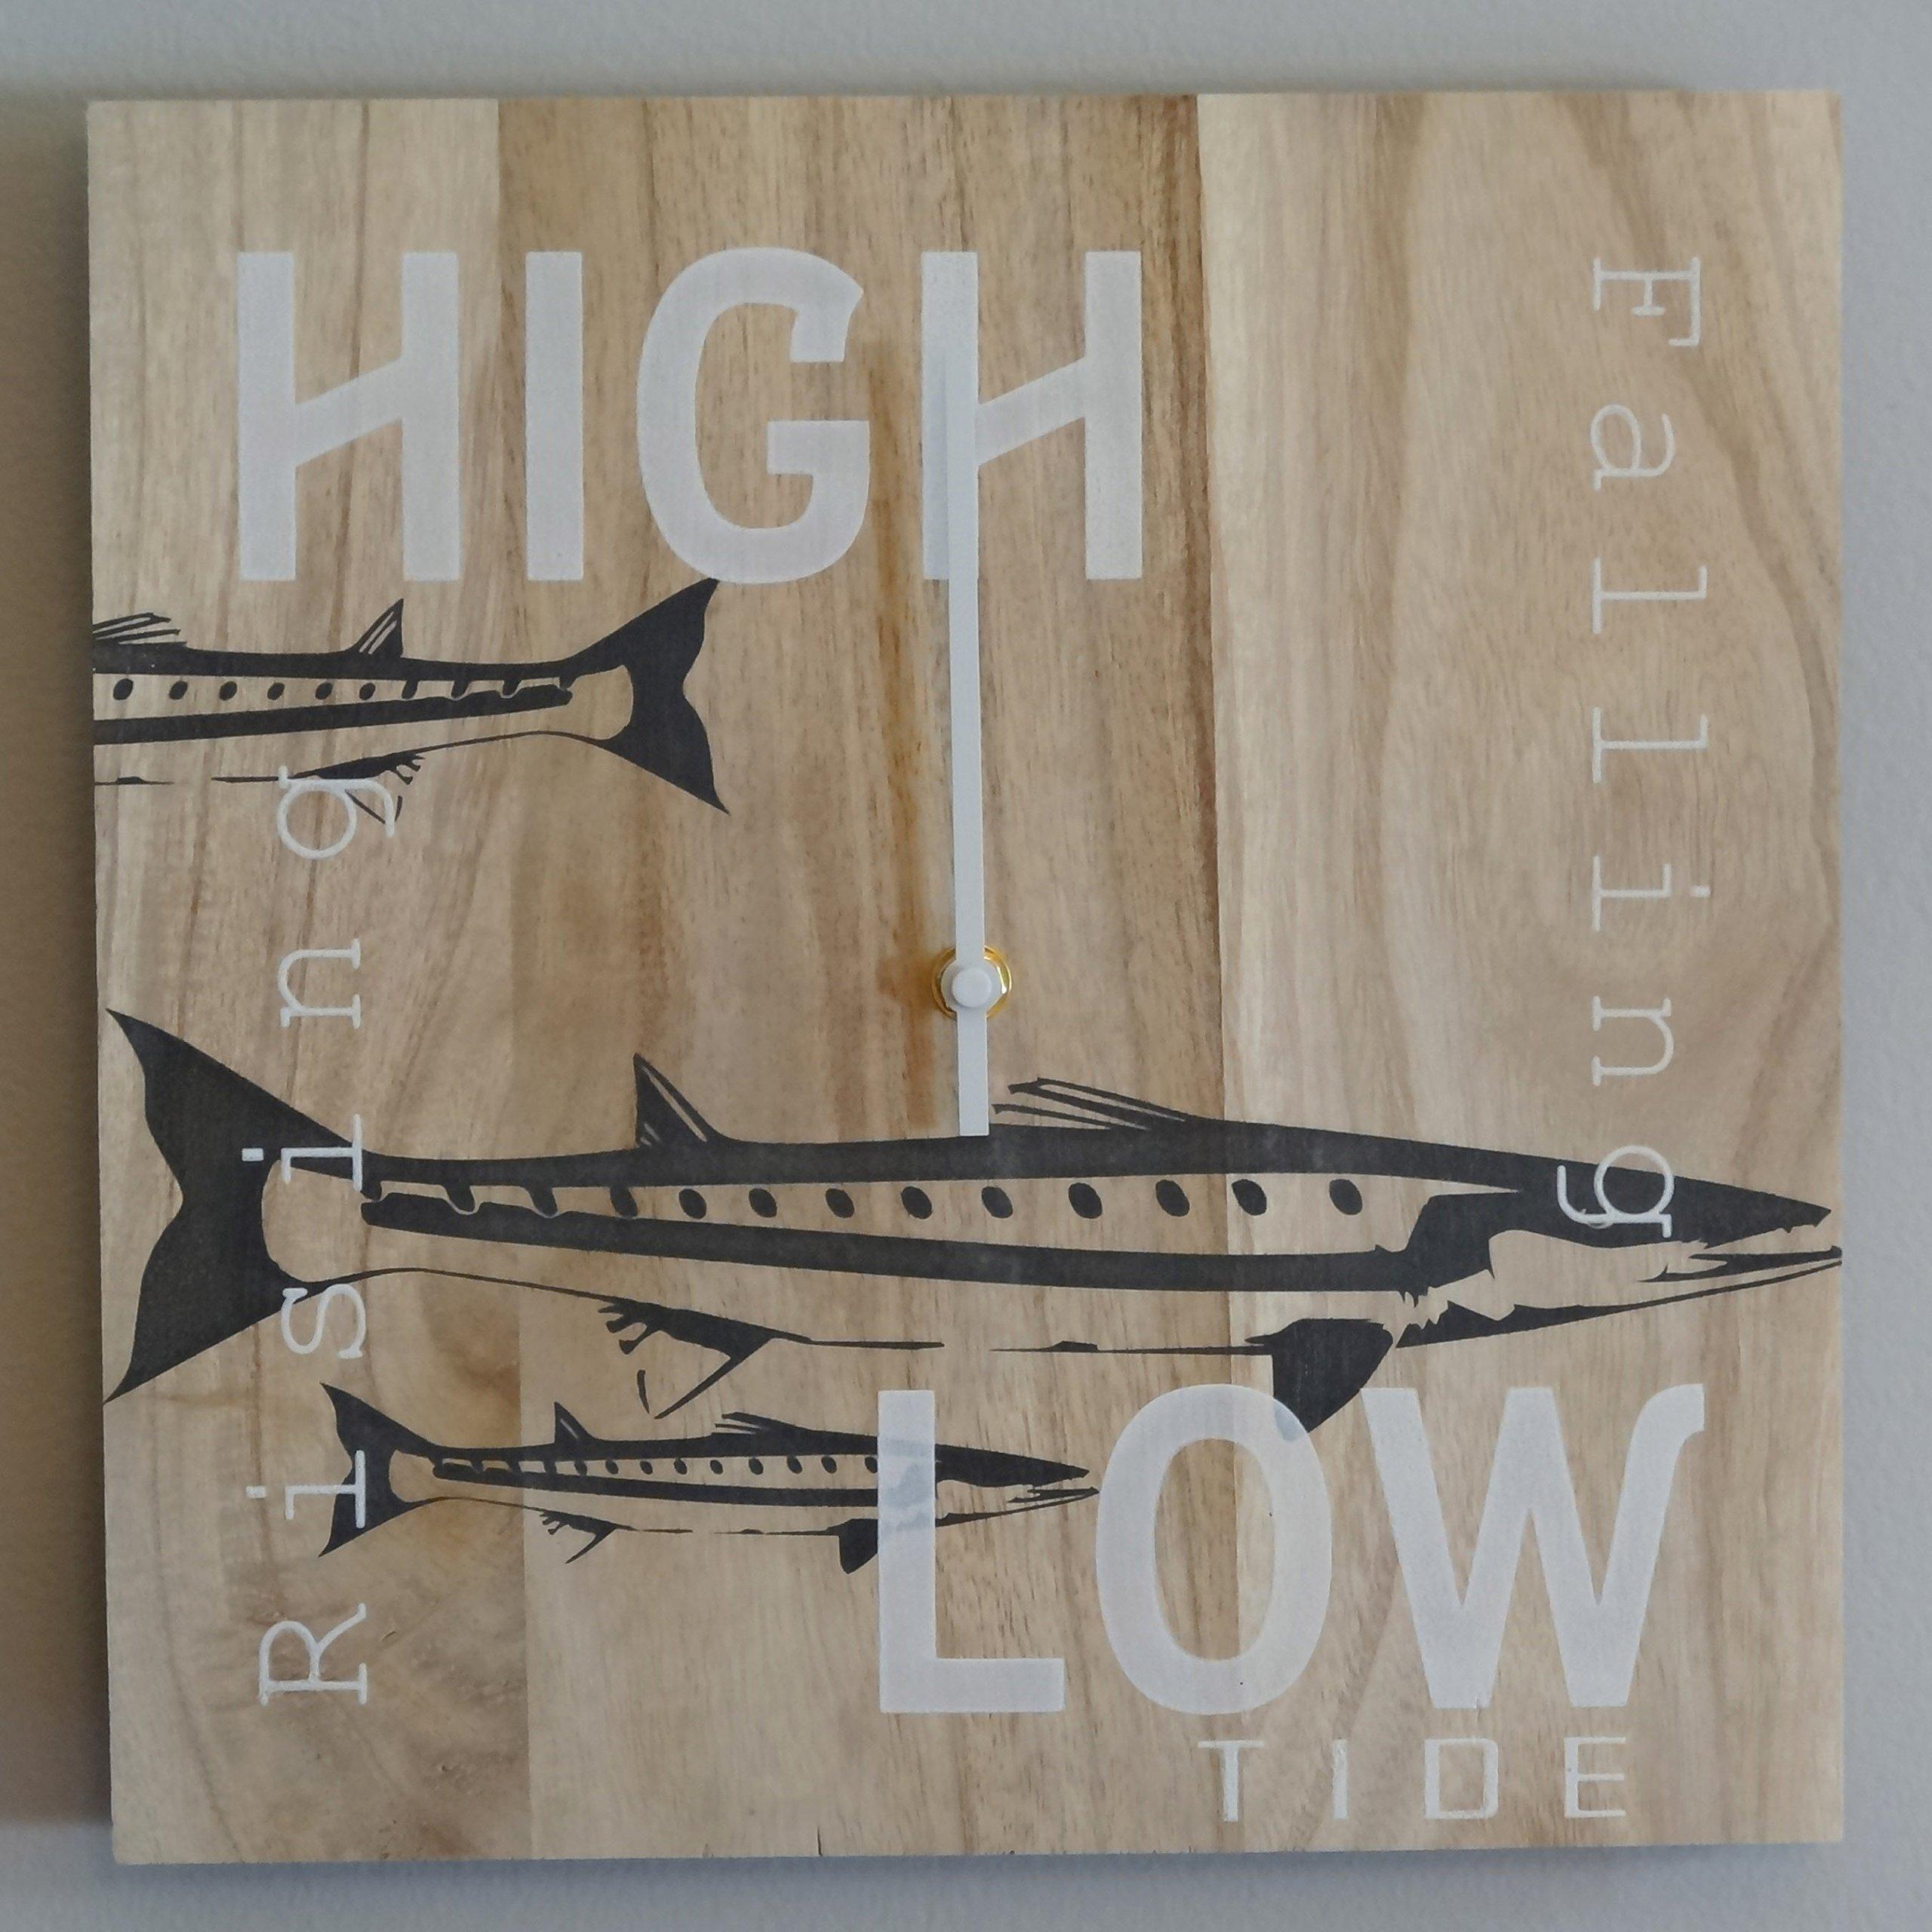 OldBleu Tide Clock Timer - Handmade - Nautical - For the Fisherman by OldBleu (Image #5)